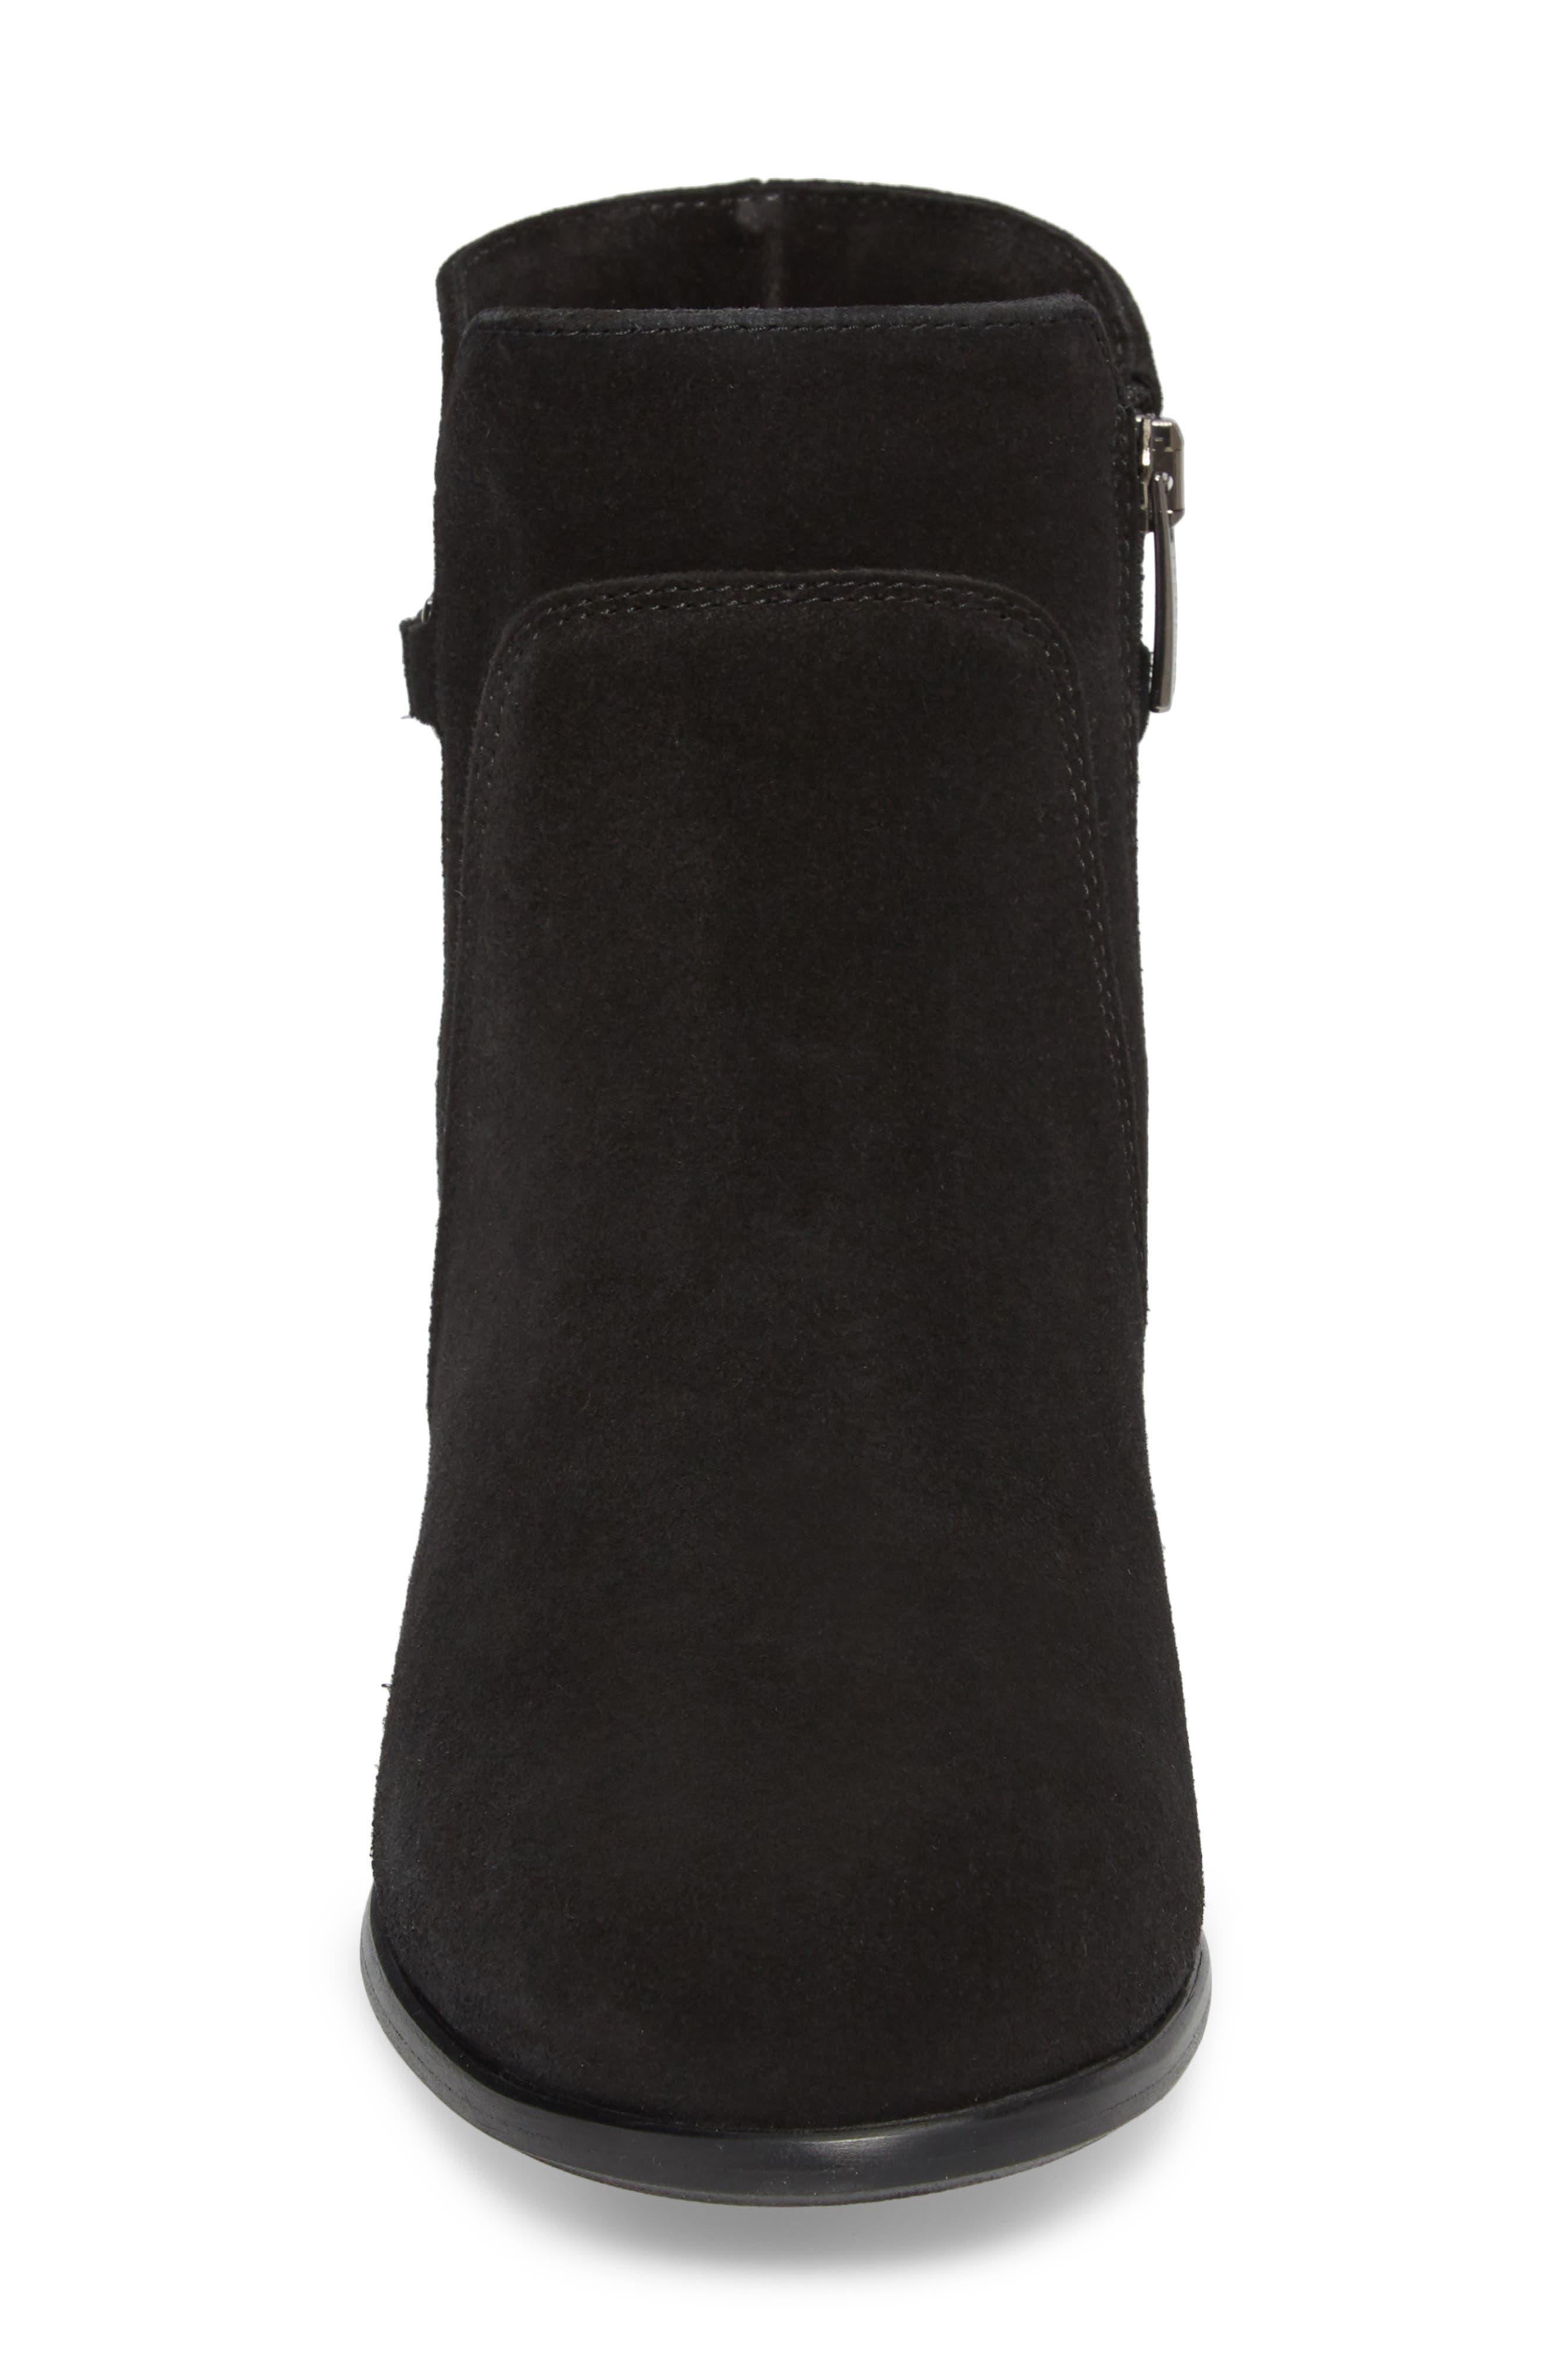 Sicilia Waterproof Boot,                             Alternate thumbnail 4, color,                             Black Suede